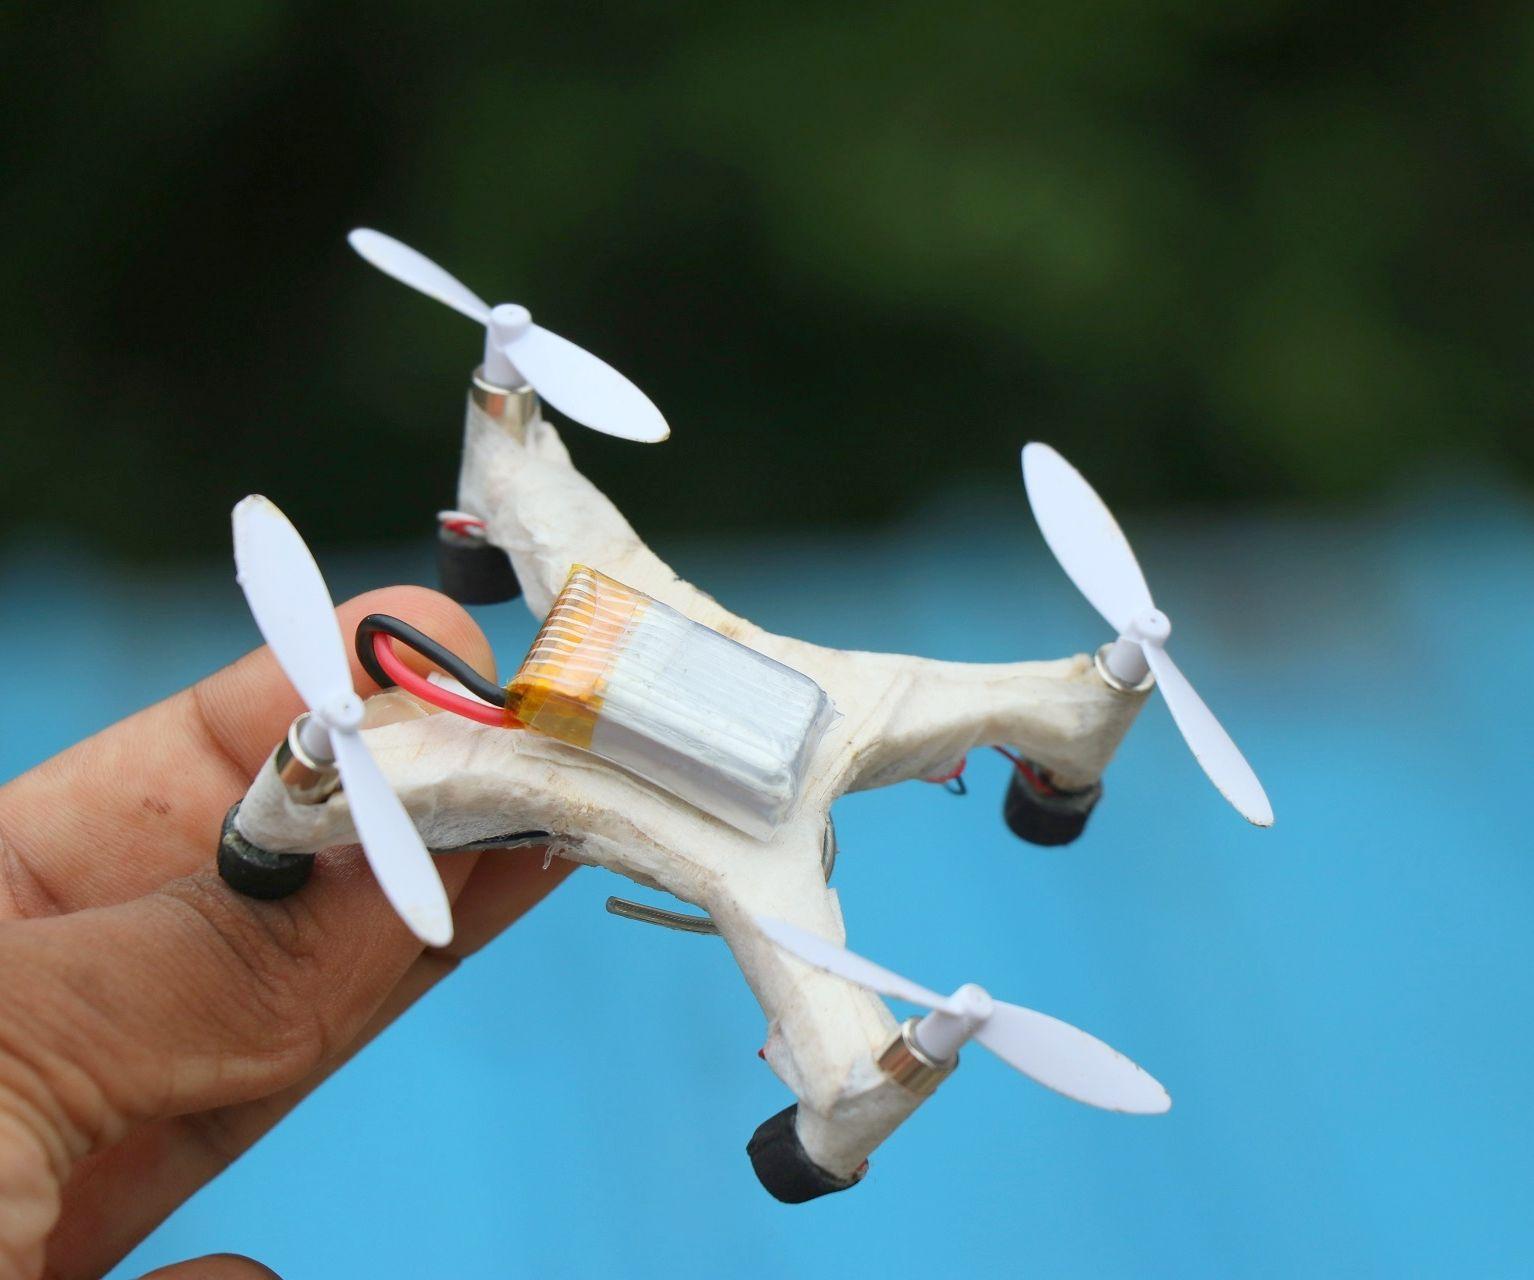 How to Make a Drone at Home - DIY Quadcopter: 5 Steps